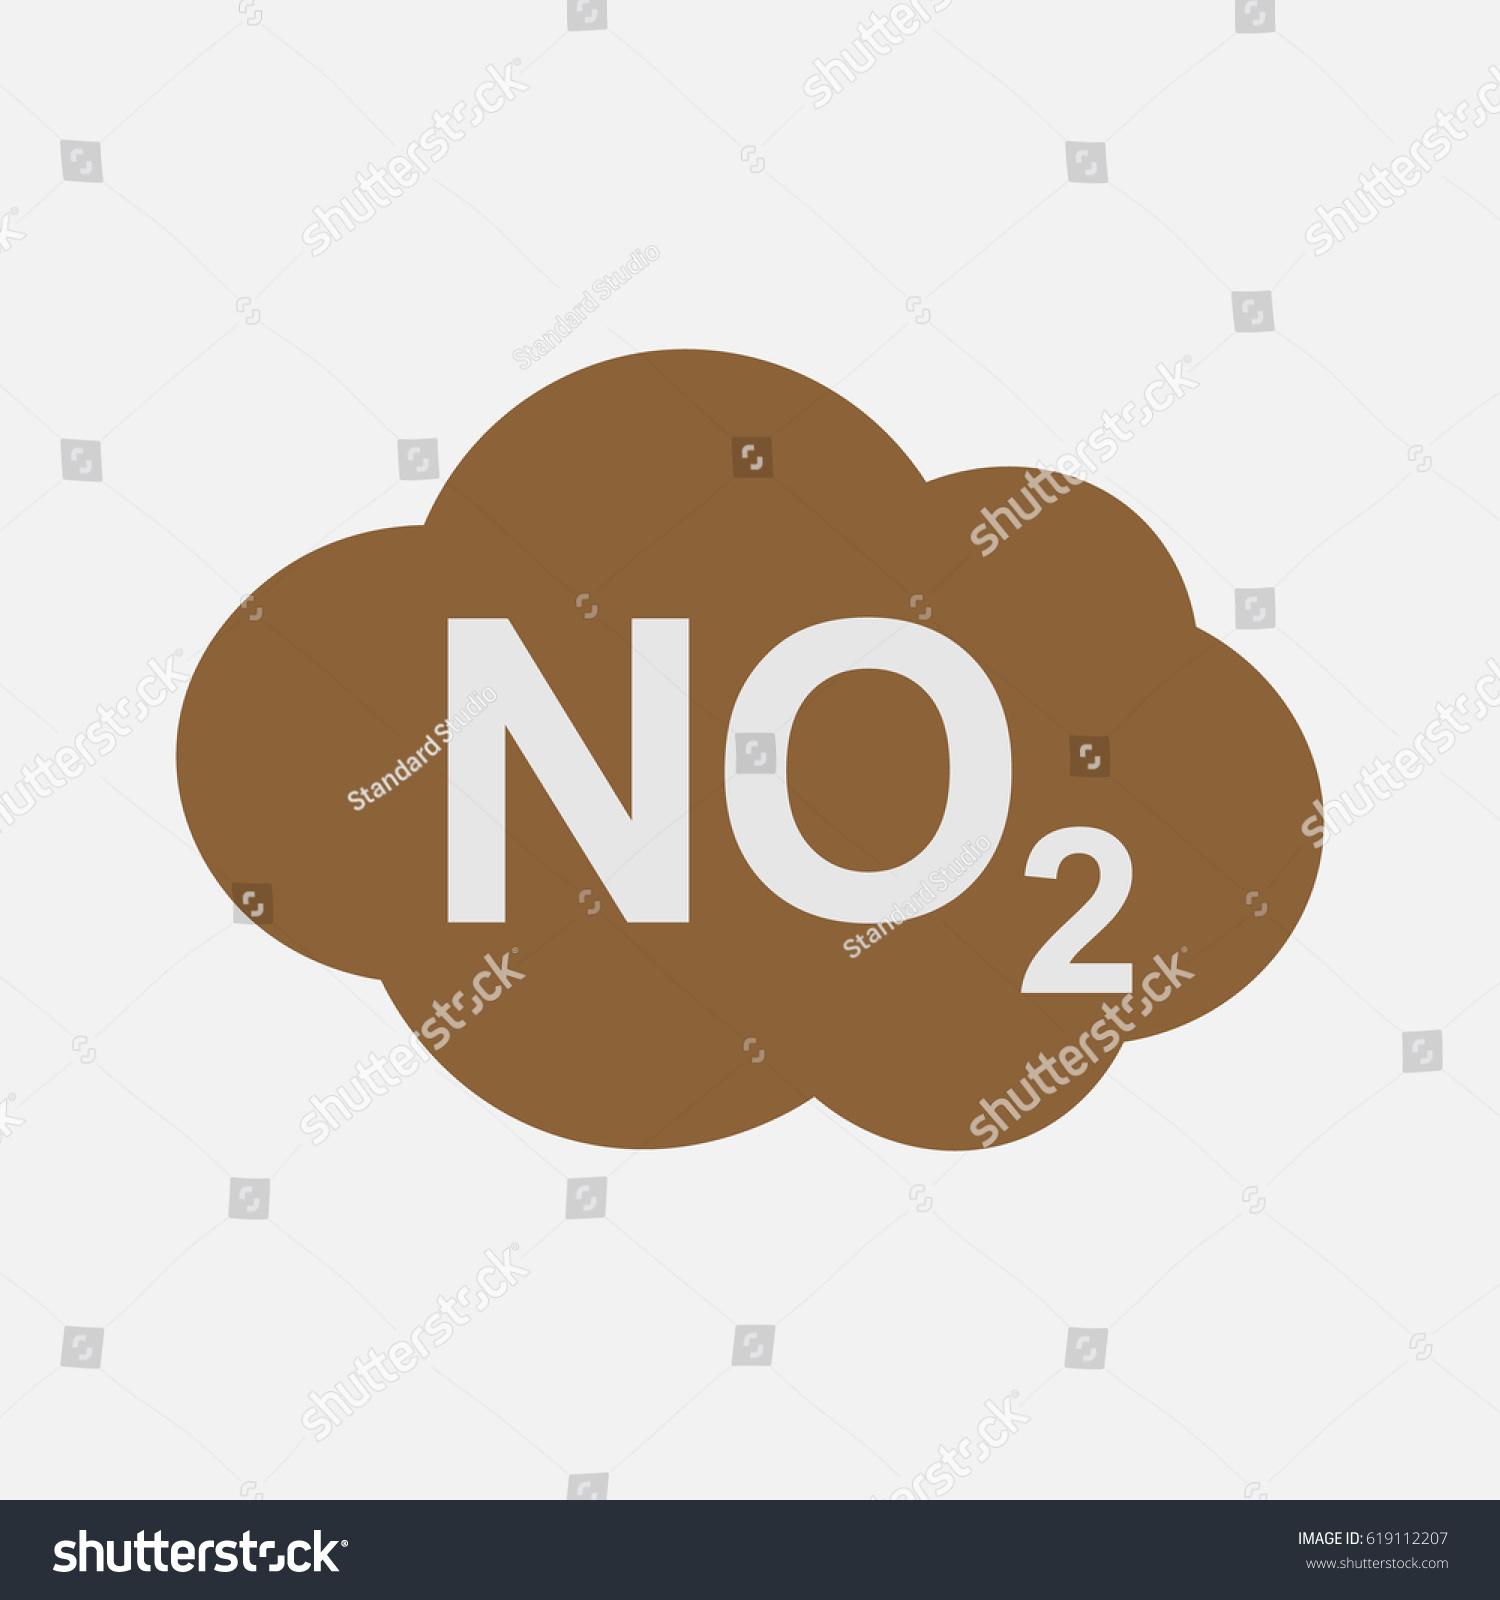 No2 icon nitrogen dioxide formula symbol stock vector 619112207 no2 icon nitrogen dioxide formula symbol vector illustration buycottarizona